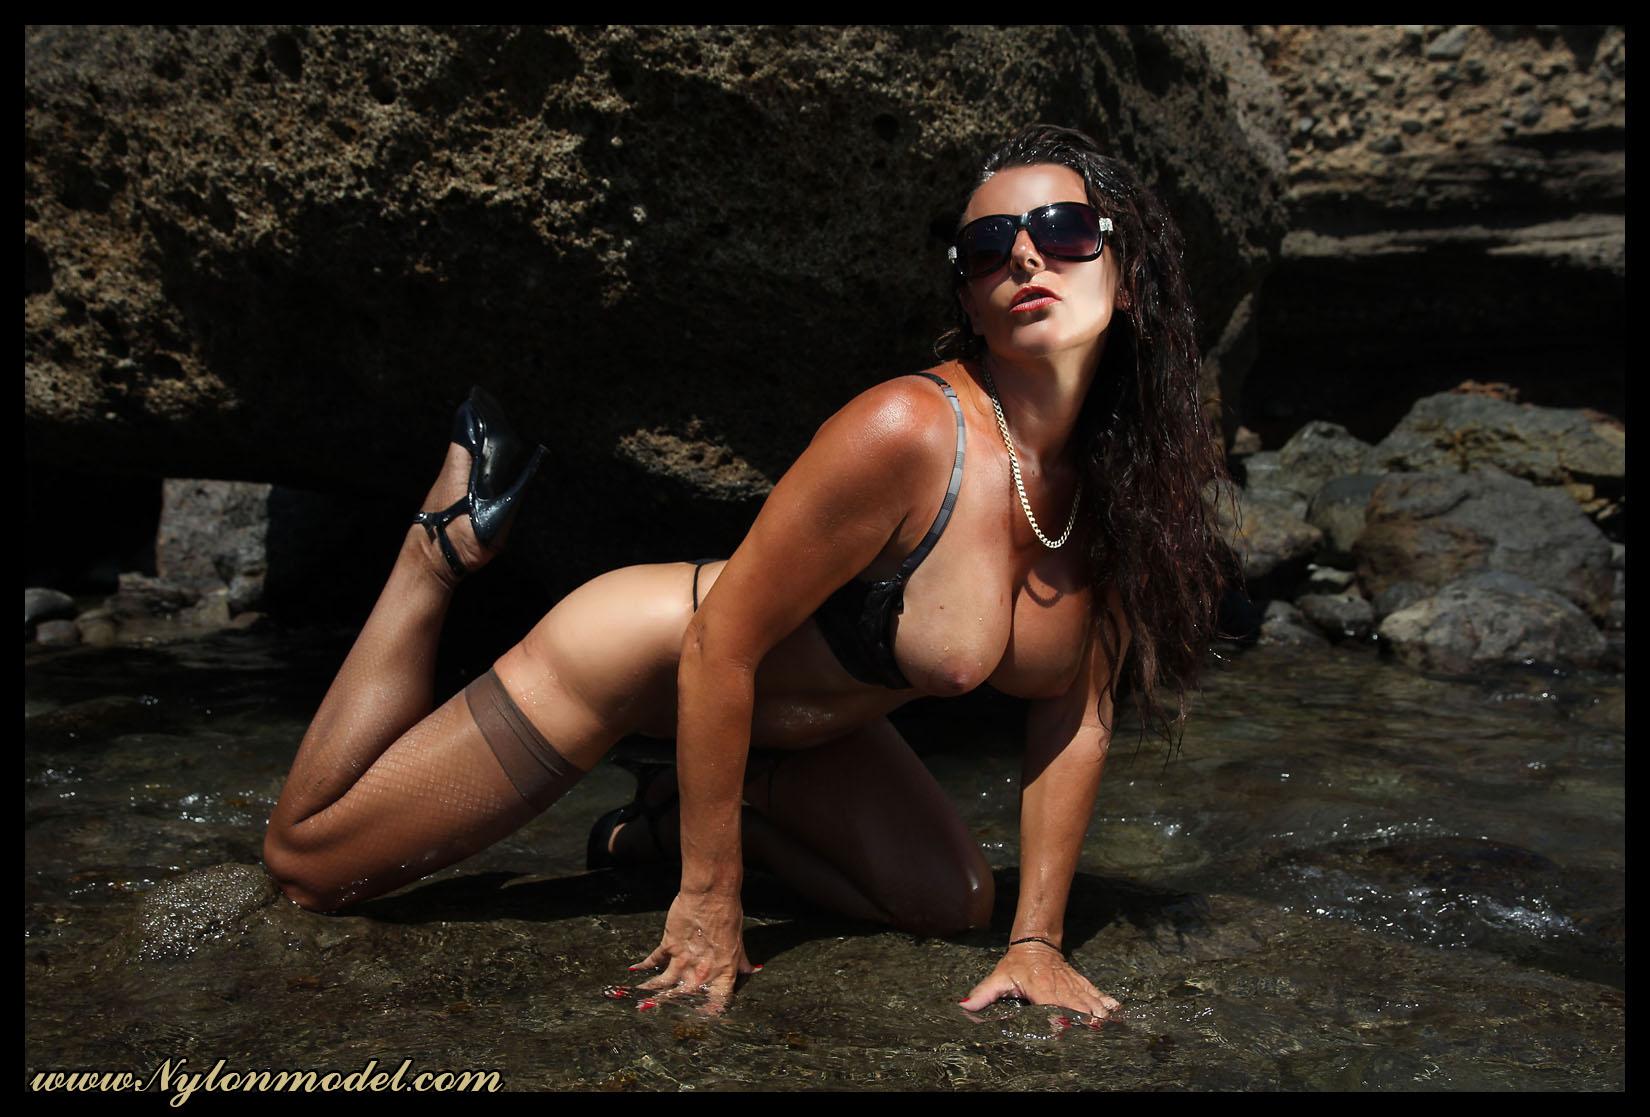 Фото голи женшини 6 фотография